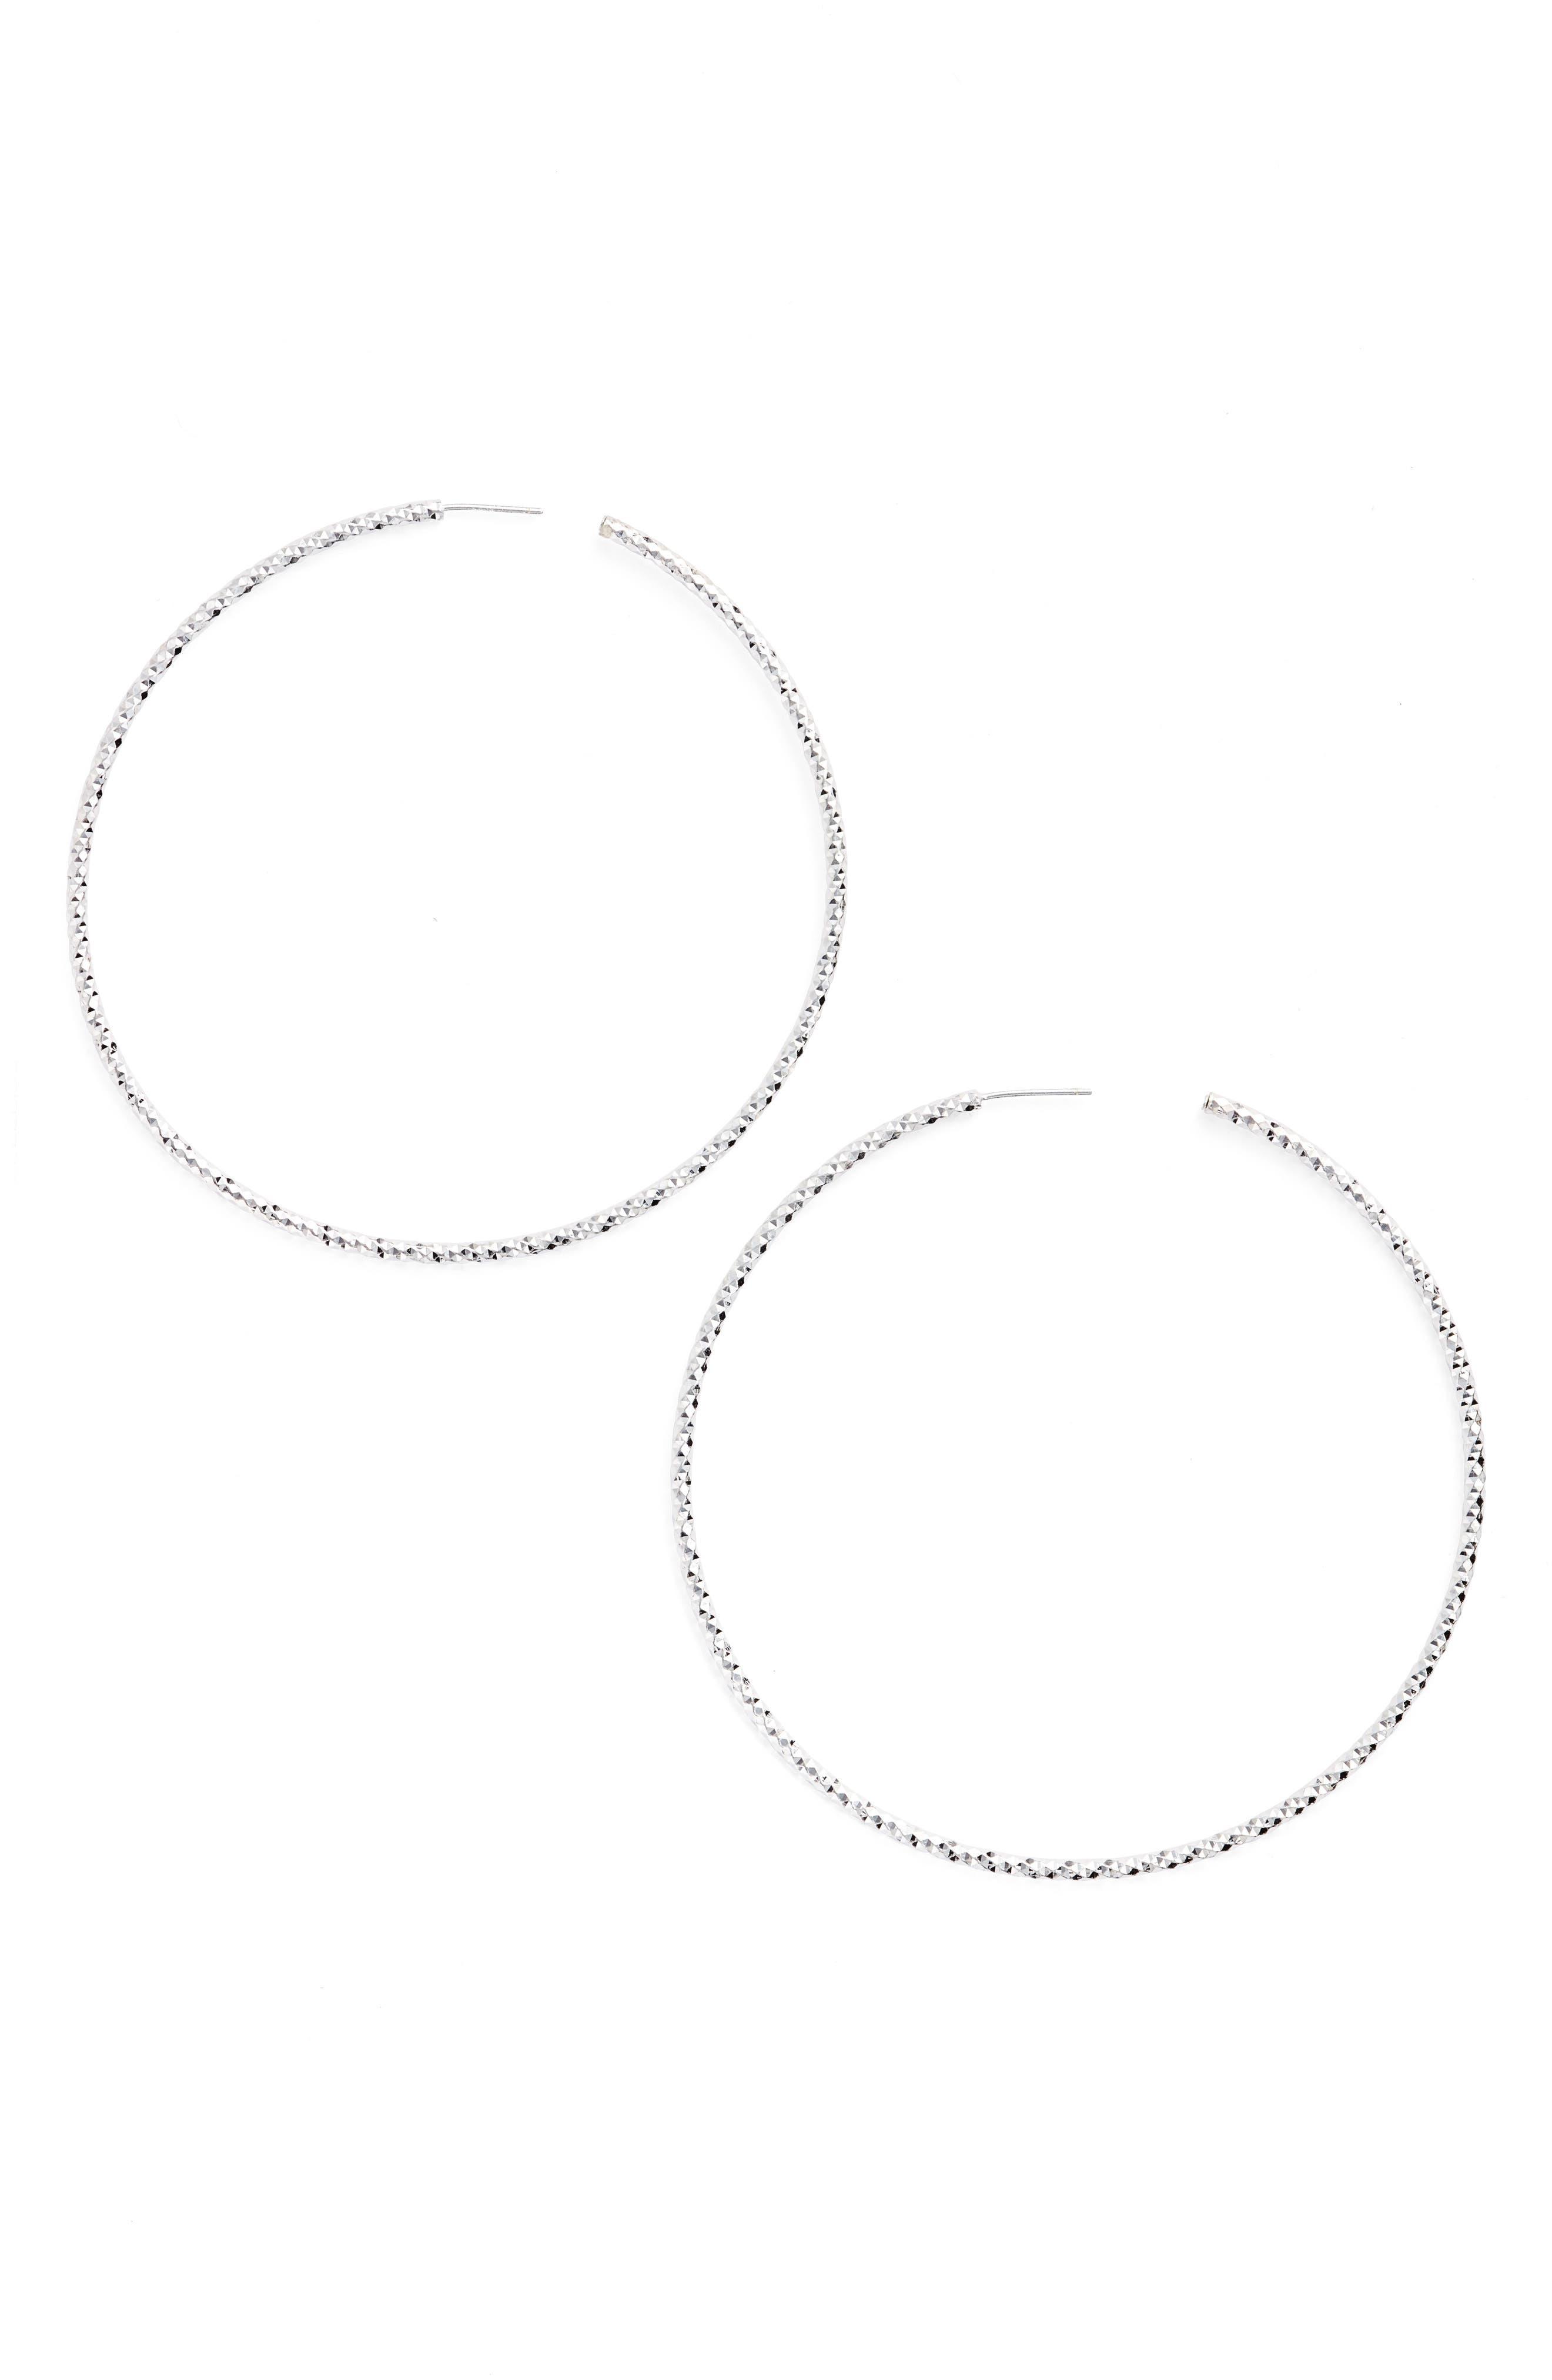 Large Hoop Earrings,                             Main thumbnail 1, color,                             040